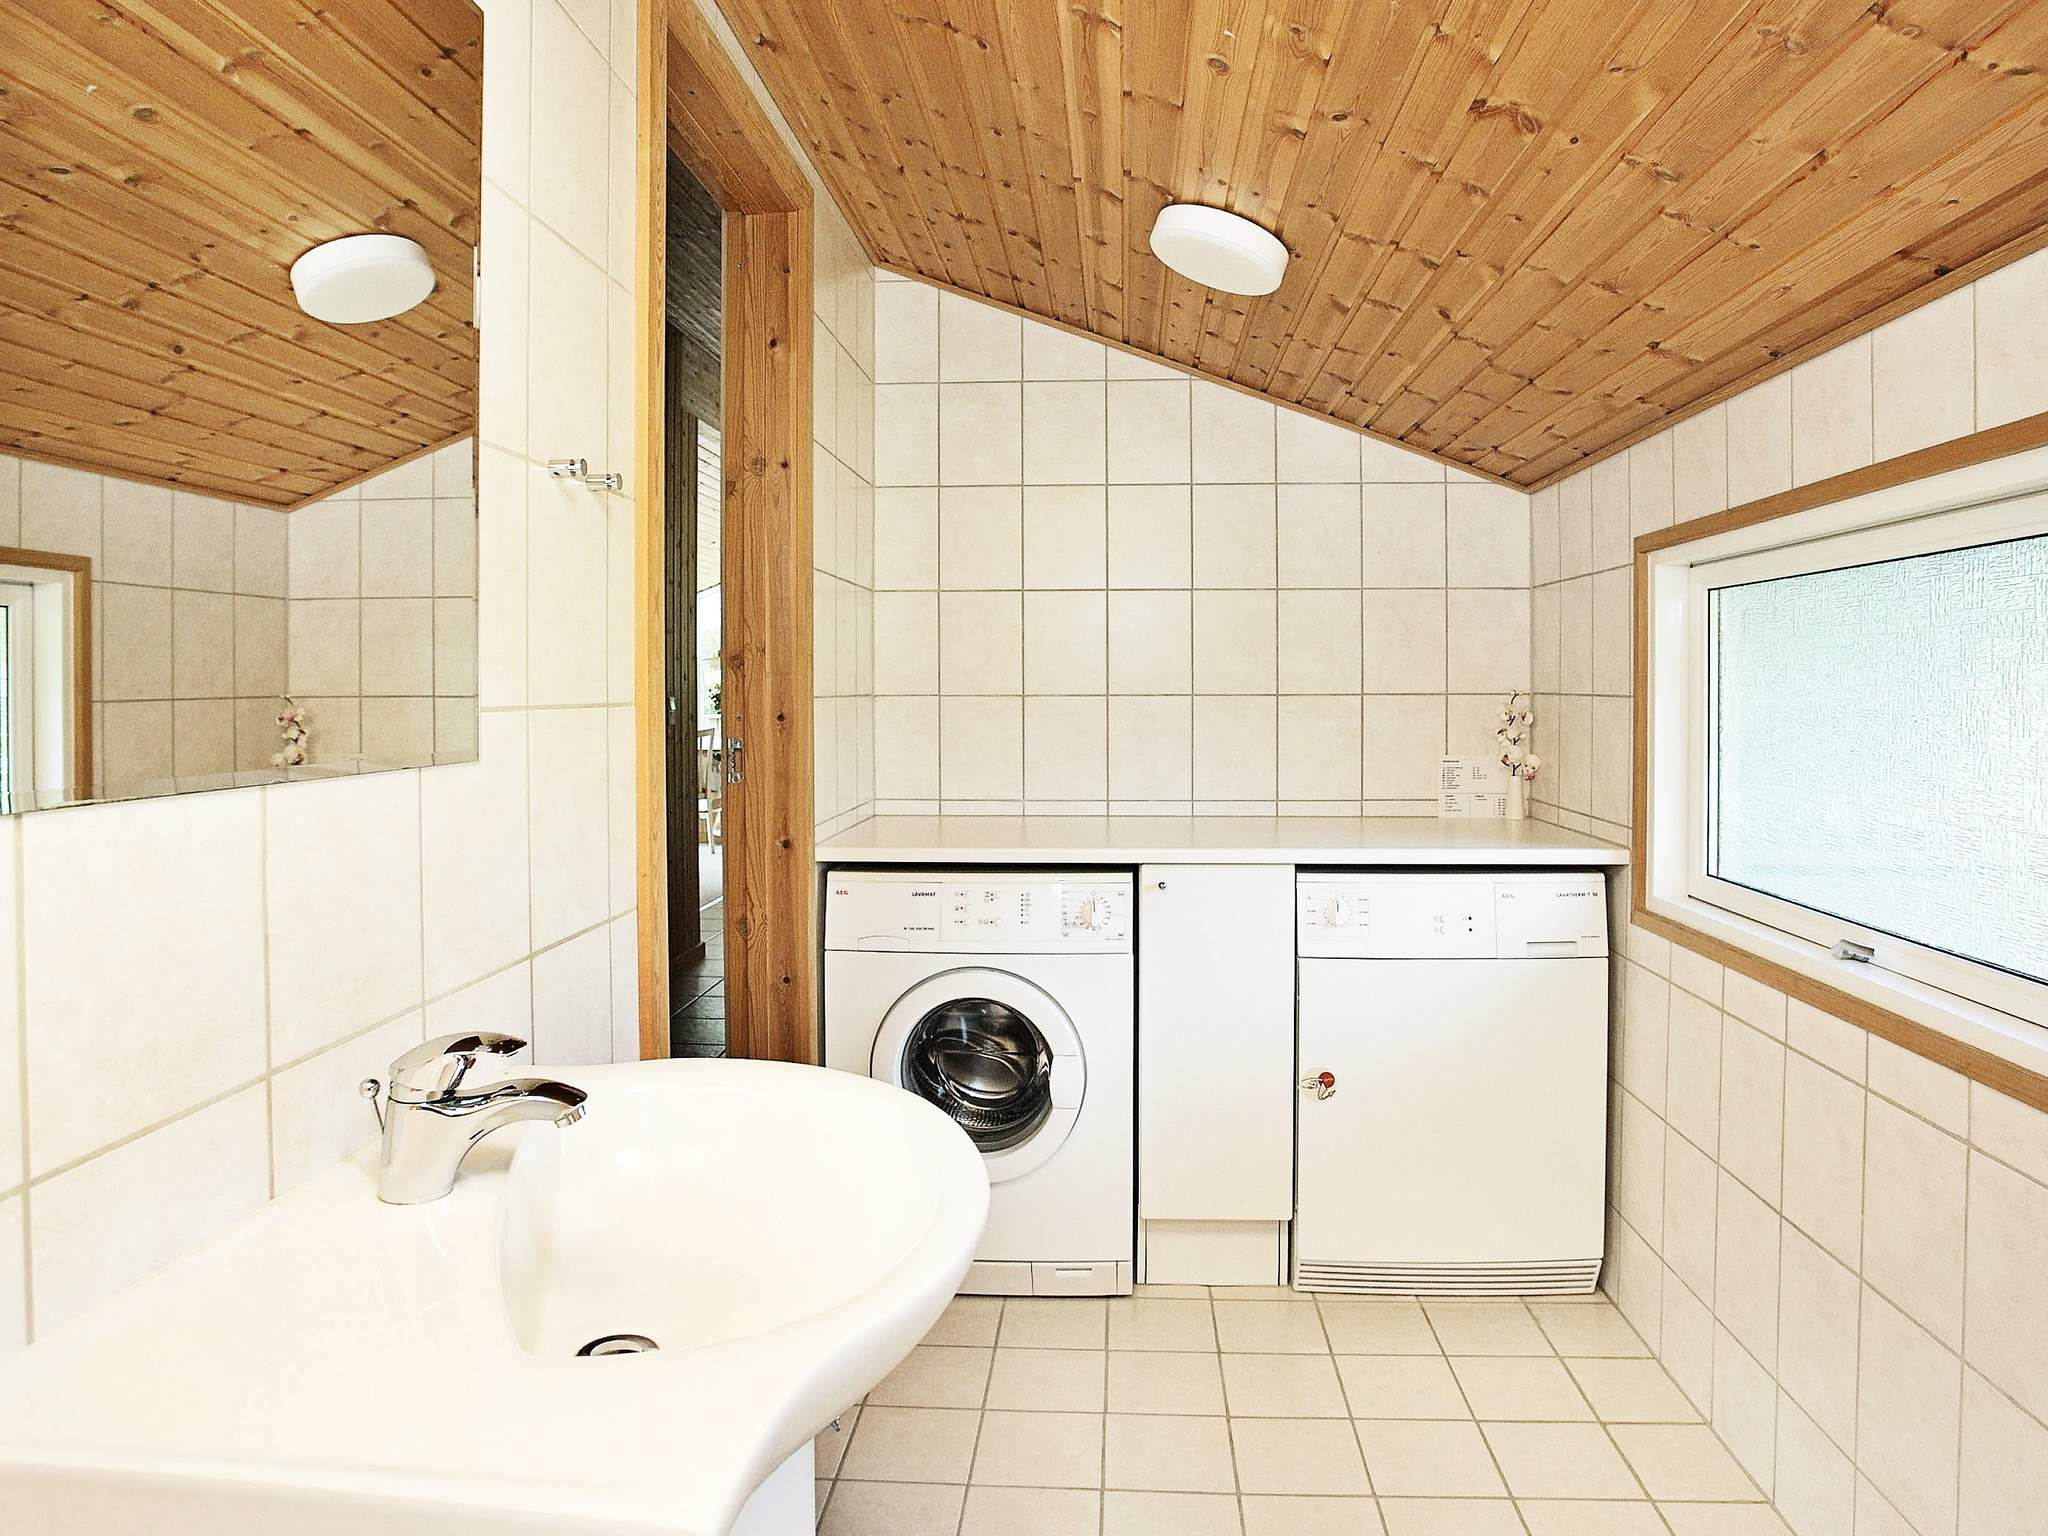 Ferienhaus Grønhøj Strand (89188), Løkken, , Nordwestjütland, Dänemark, Bild 10